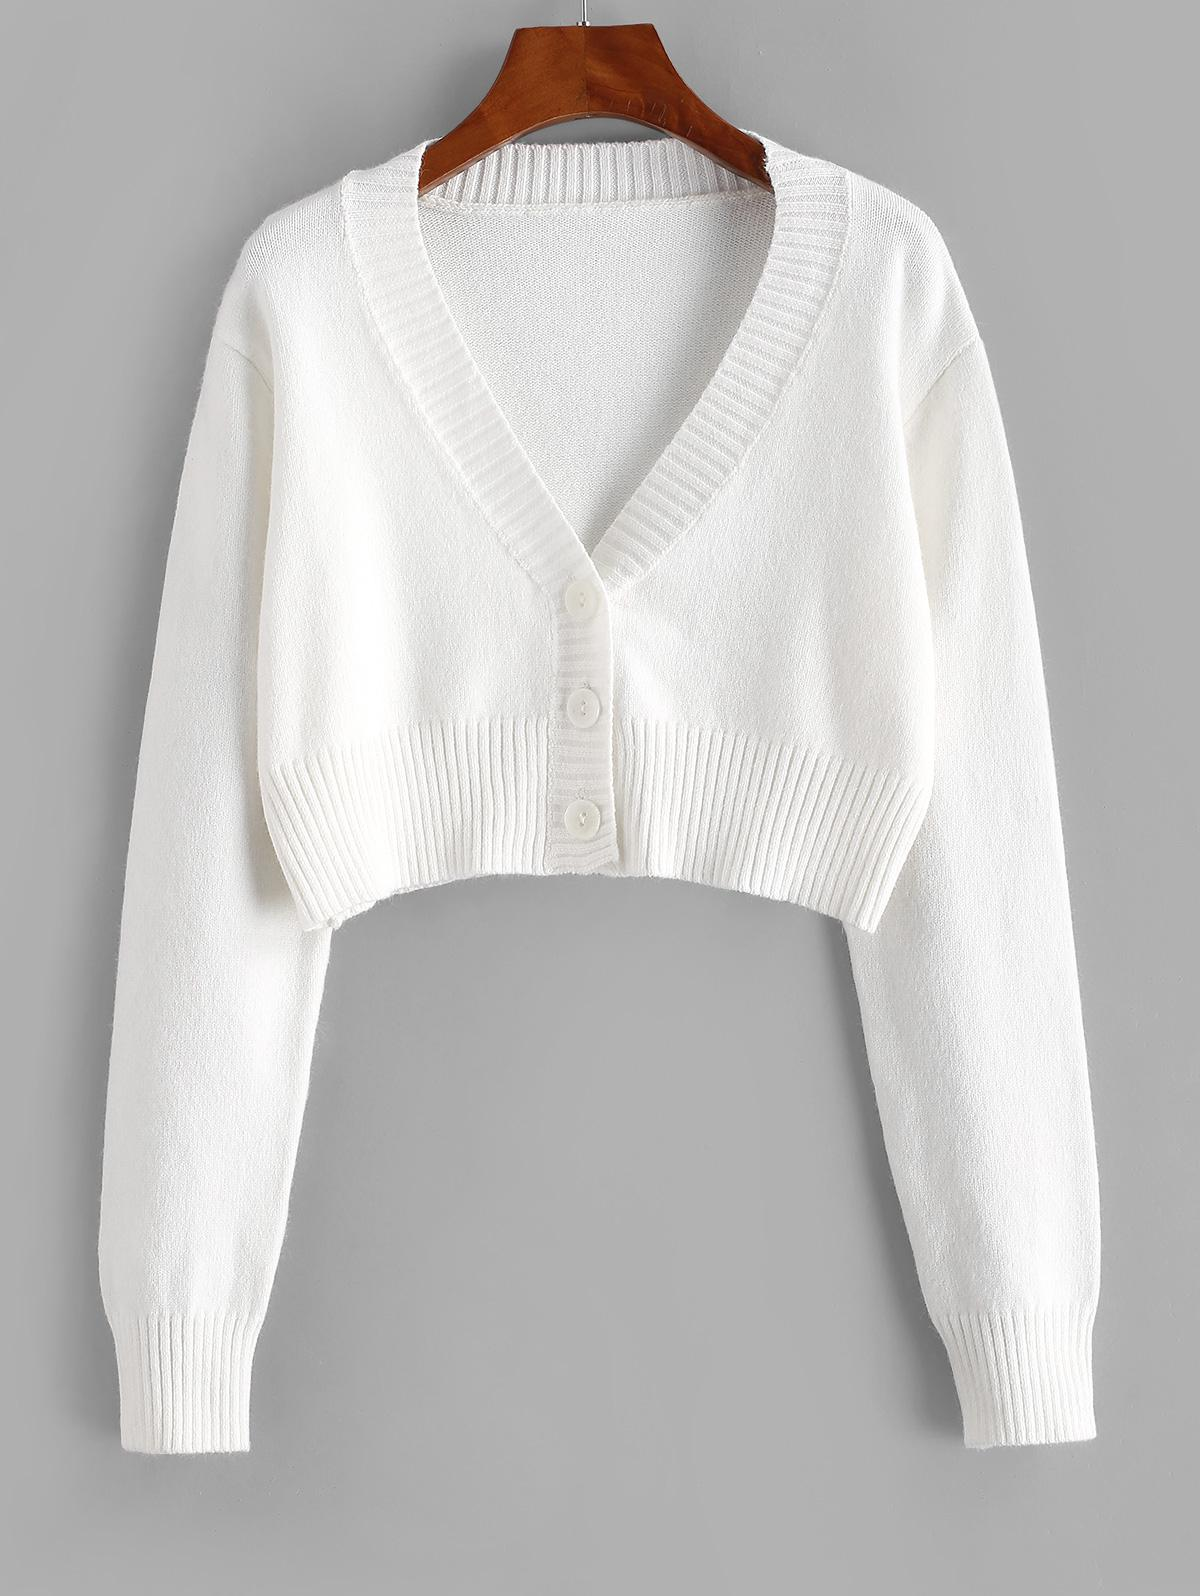 Rib-knit Trim Button Up Crop Cardigan